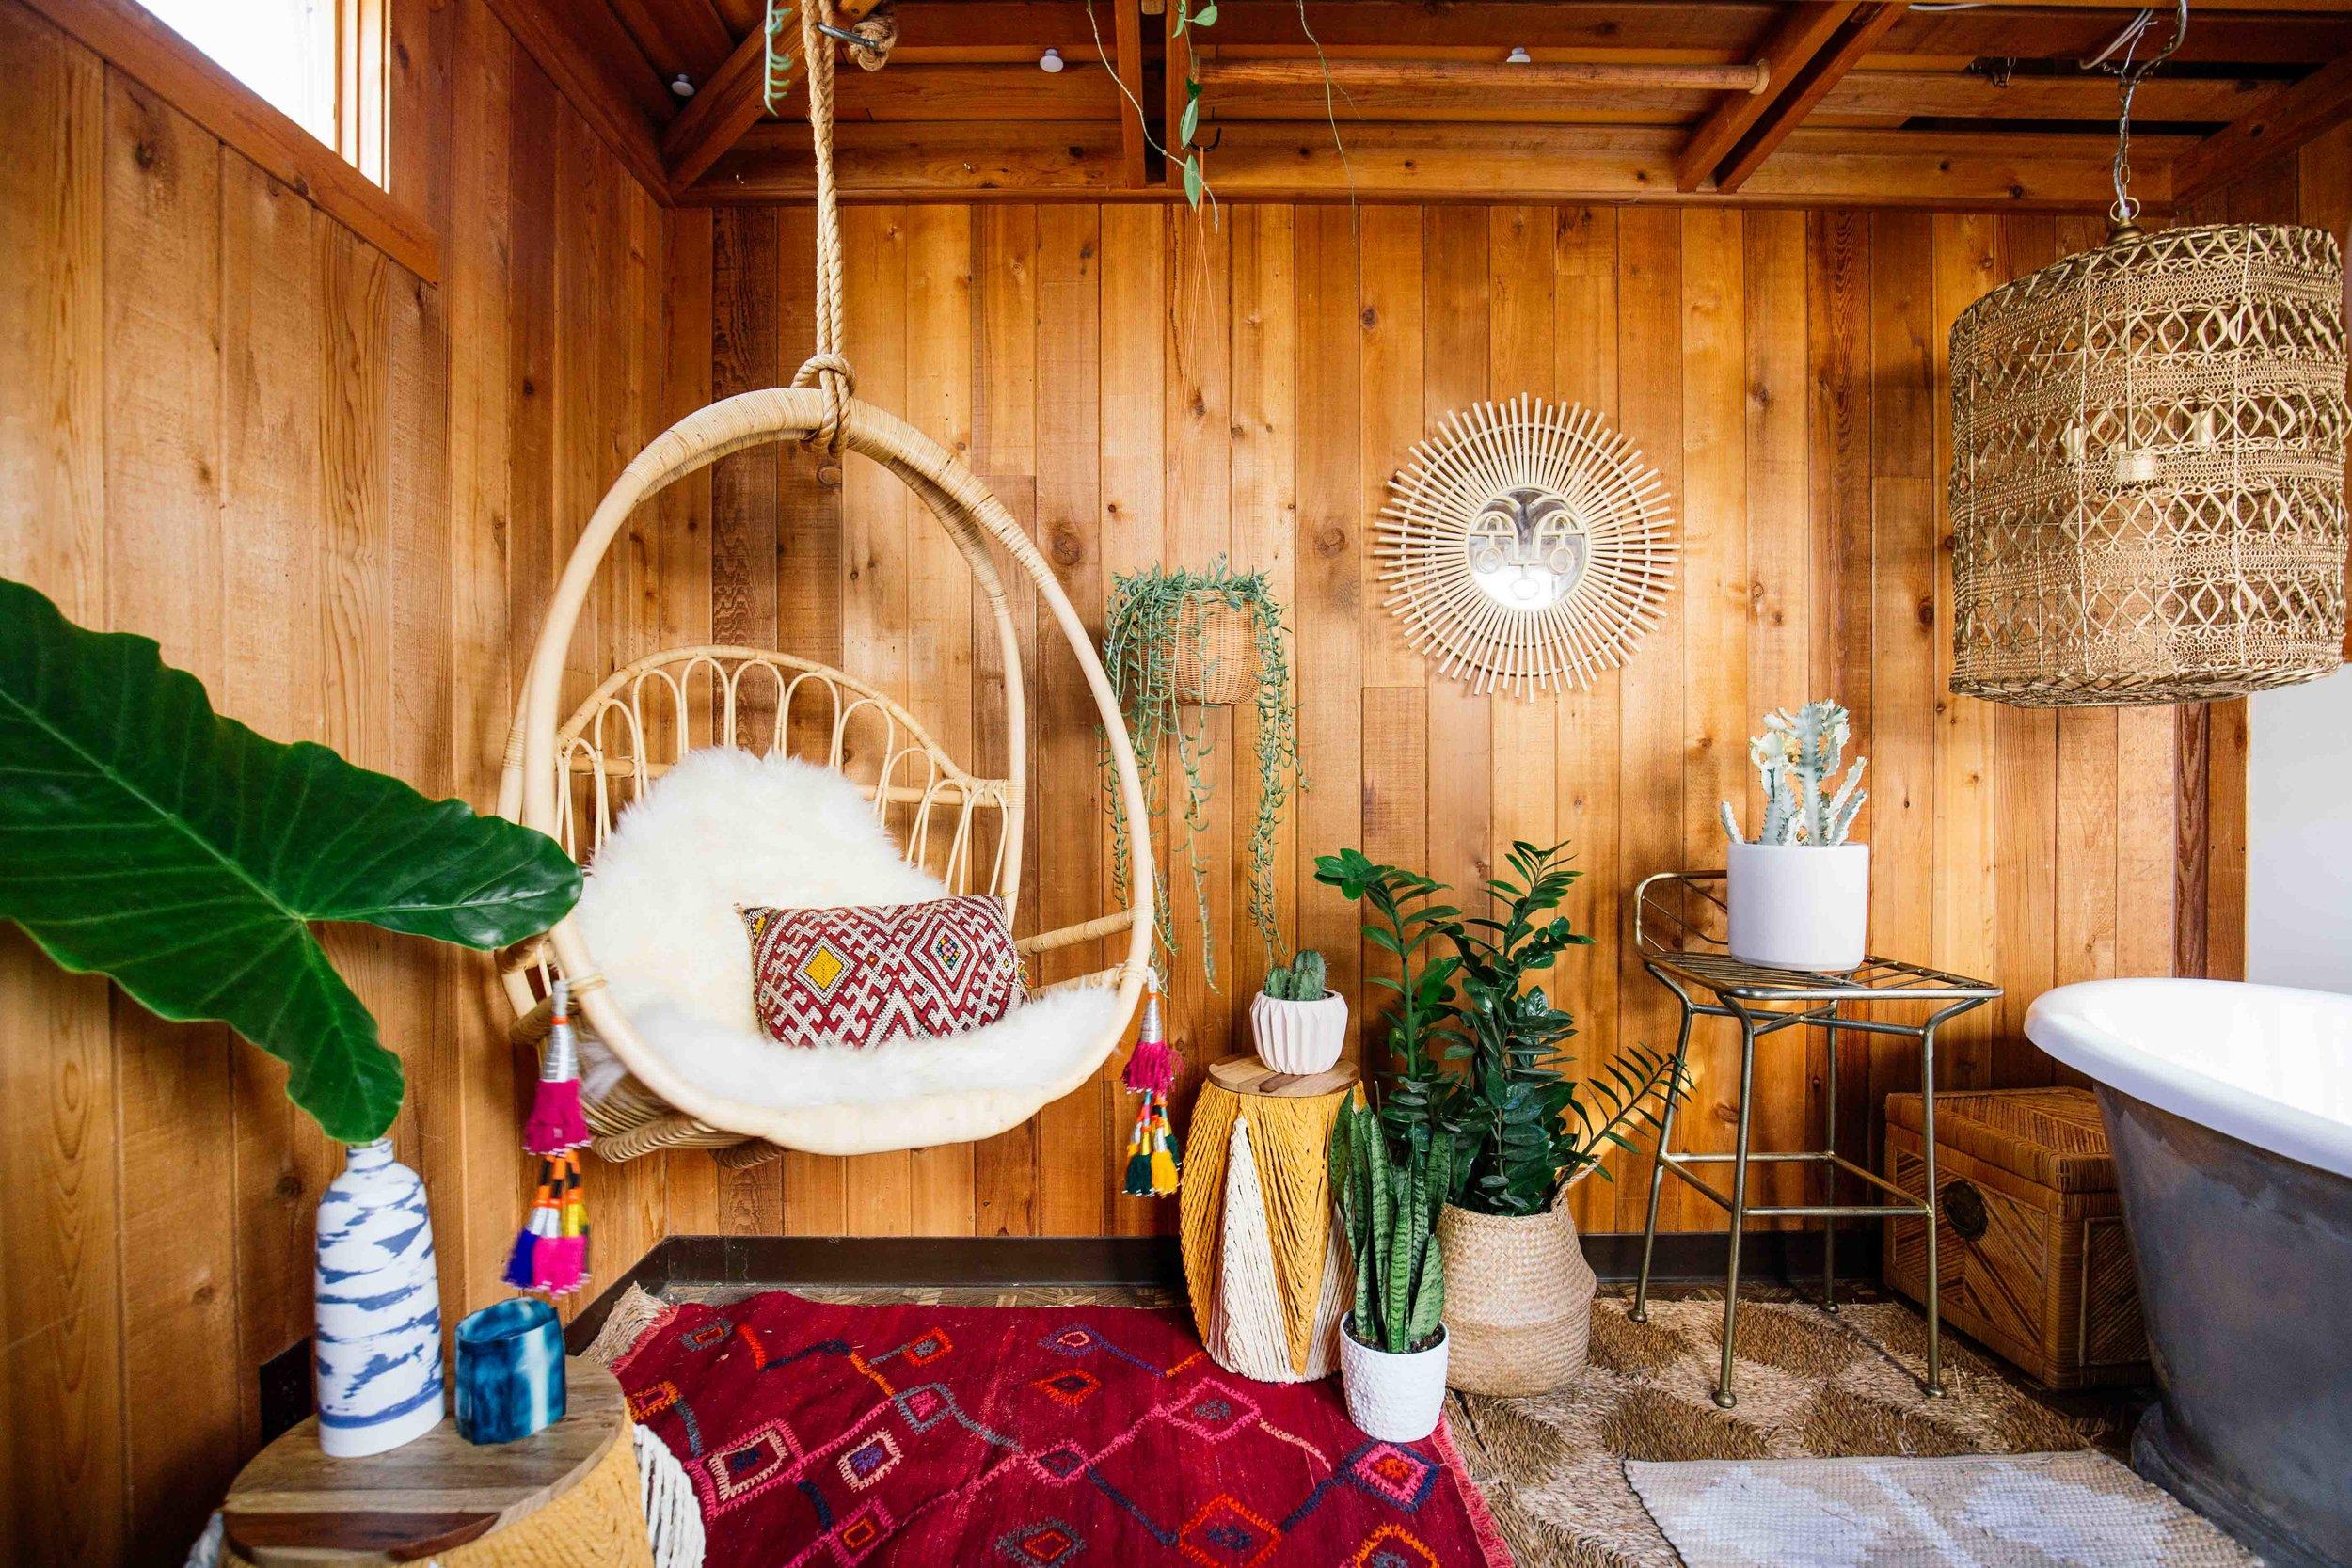 Justina Blakeney Furniture Collection For Selamat Designs